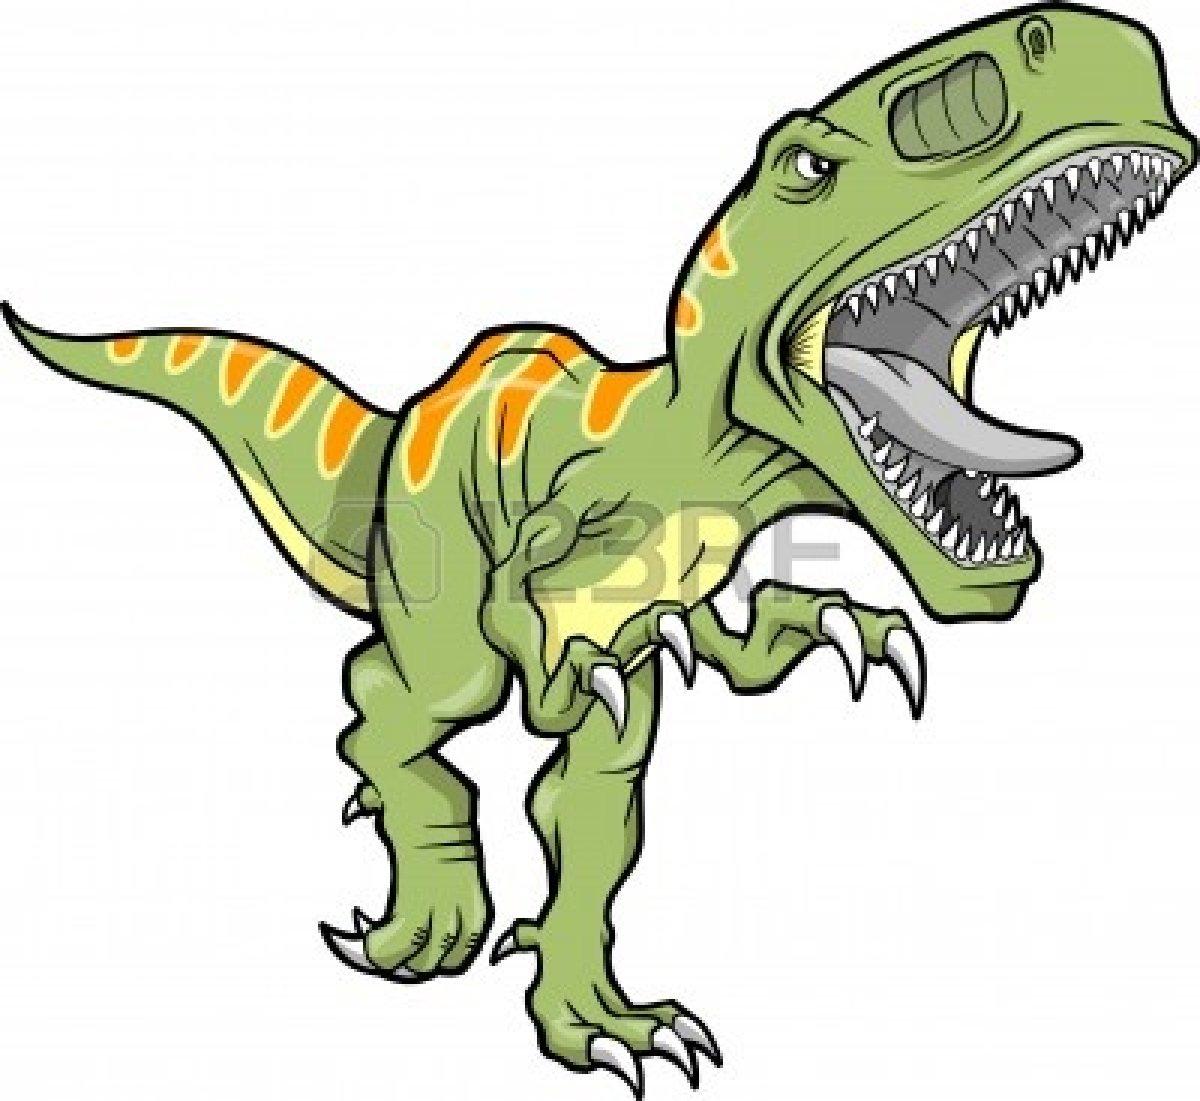 Rex dinosaur clipart.